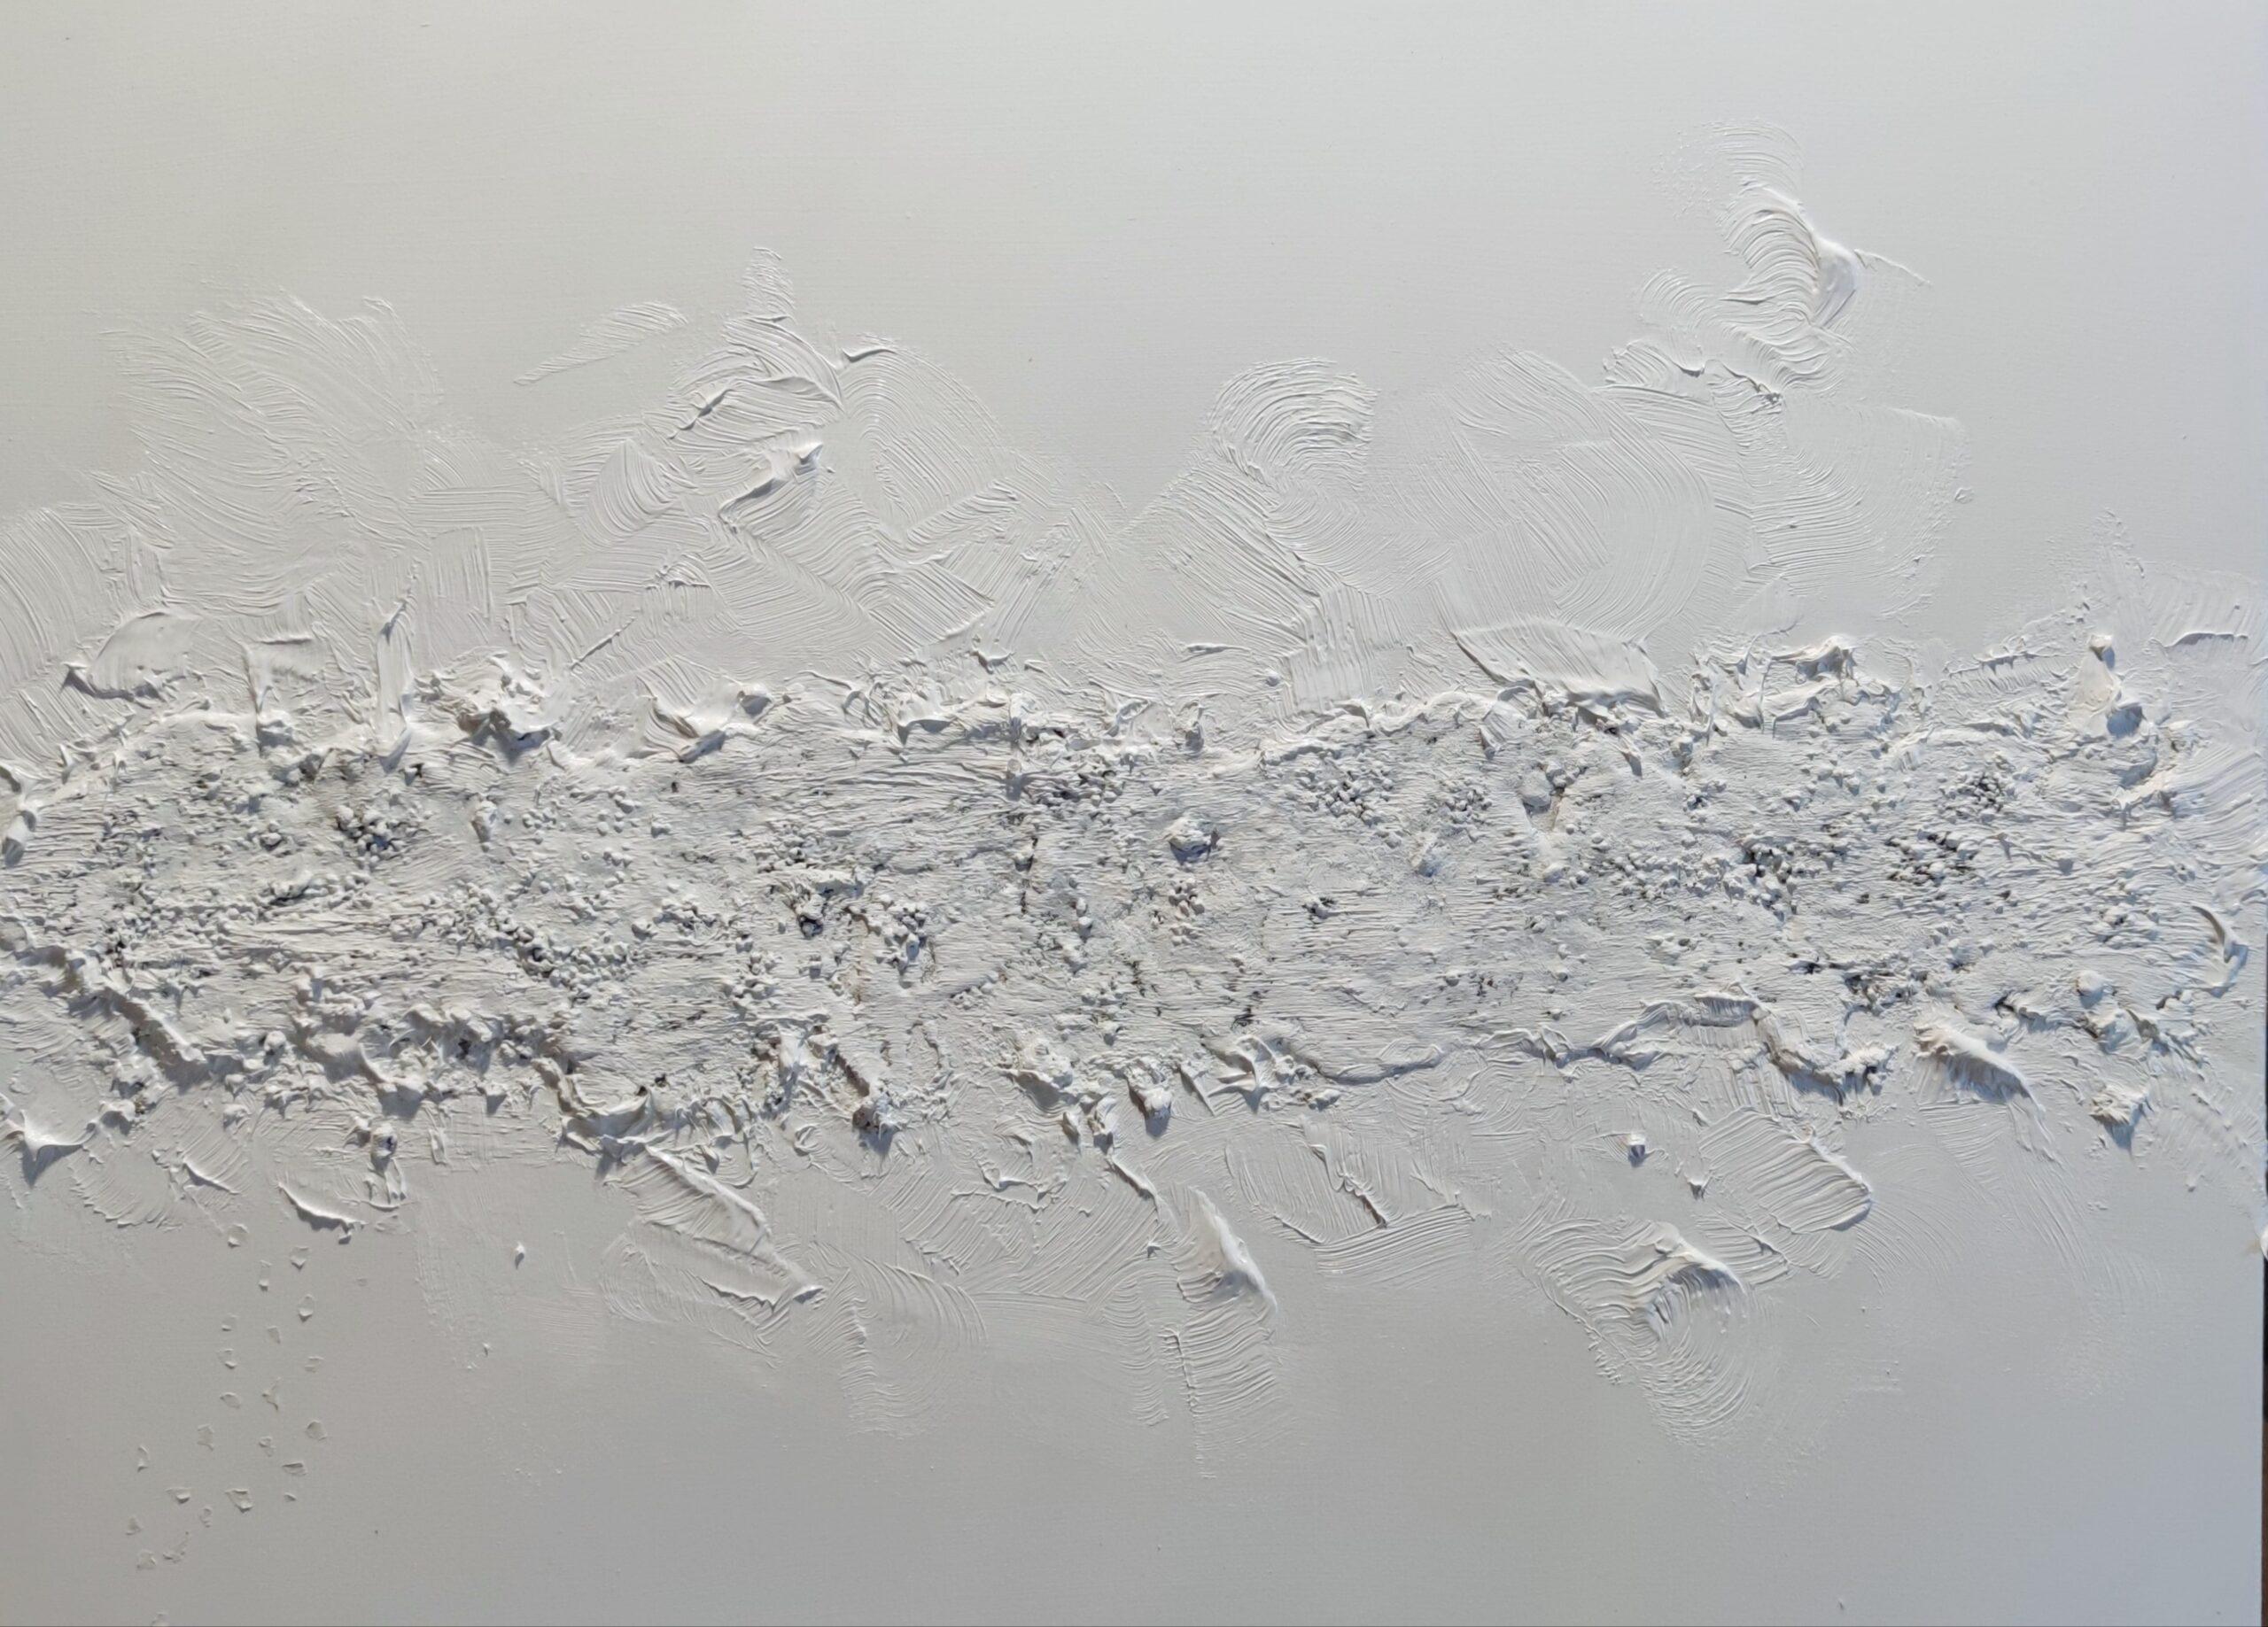 Nadia Barresi Vacuo 2 olio sabbia carta su tela cm 60x80 2021